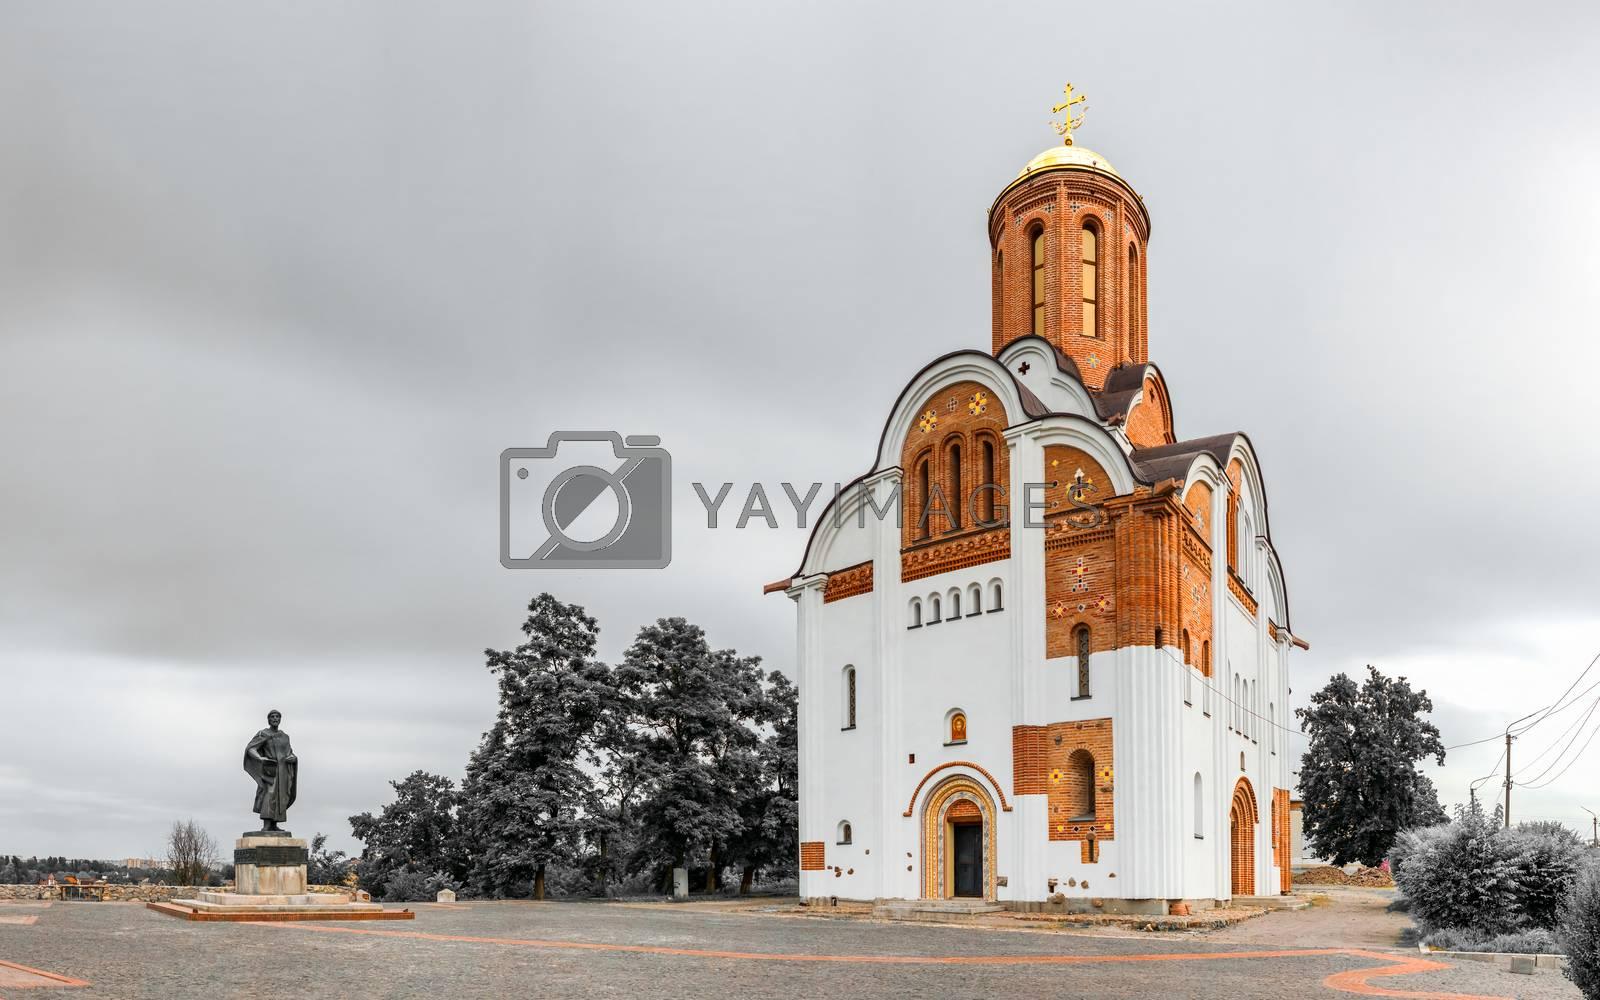 Bila Tserkva, Ukraine 06.20.2020. Georgiyivska or Heorhiyivska church in the city of Bila Tserkva, Ukraine, on a cloudy summer day